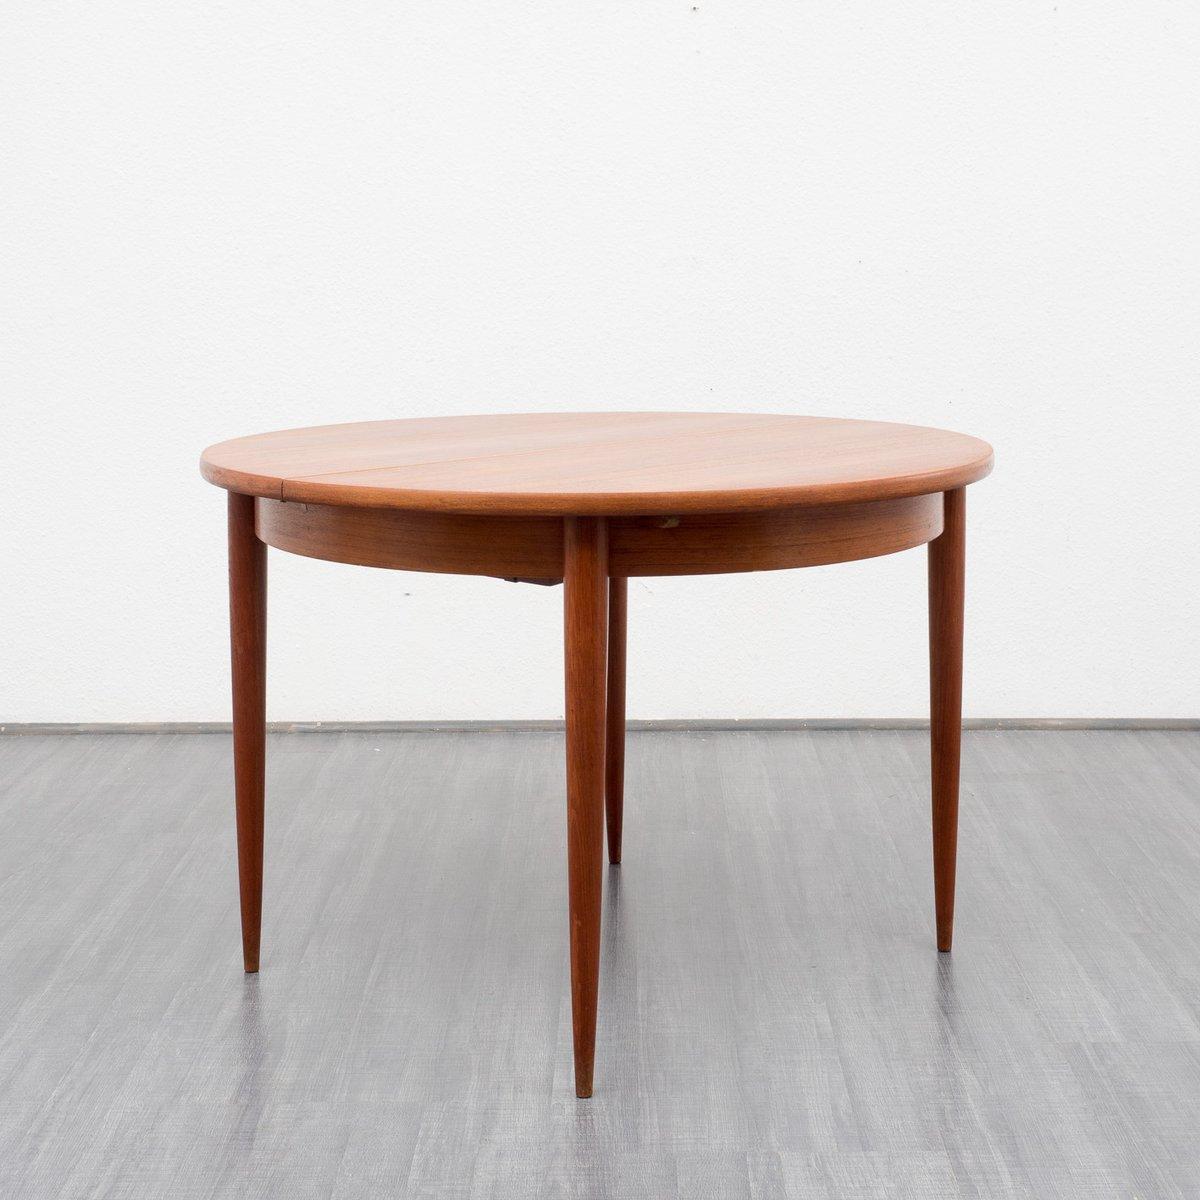 Scandinavian style dining table jaxon scandinavian style dining table white buy den - Dining table scandinavian ...